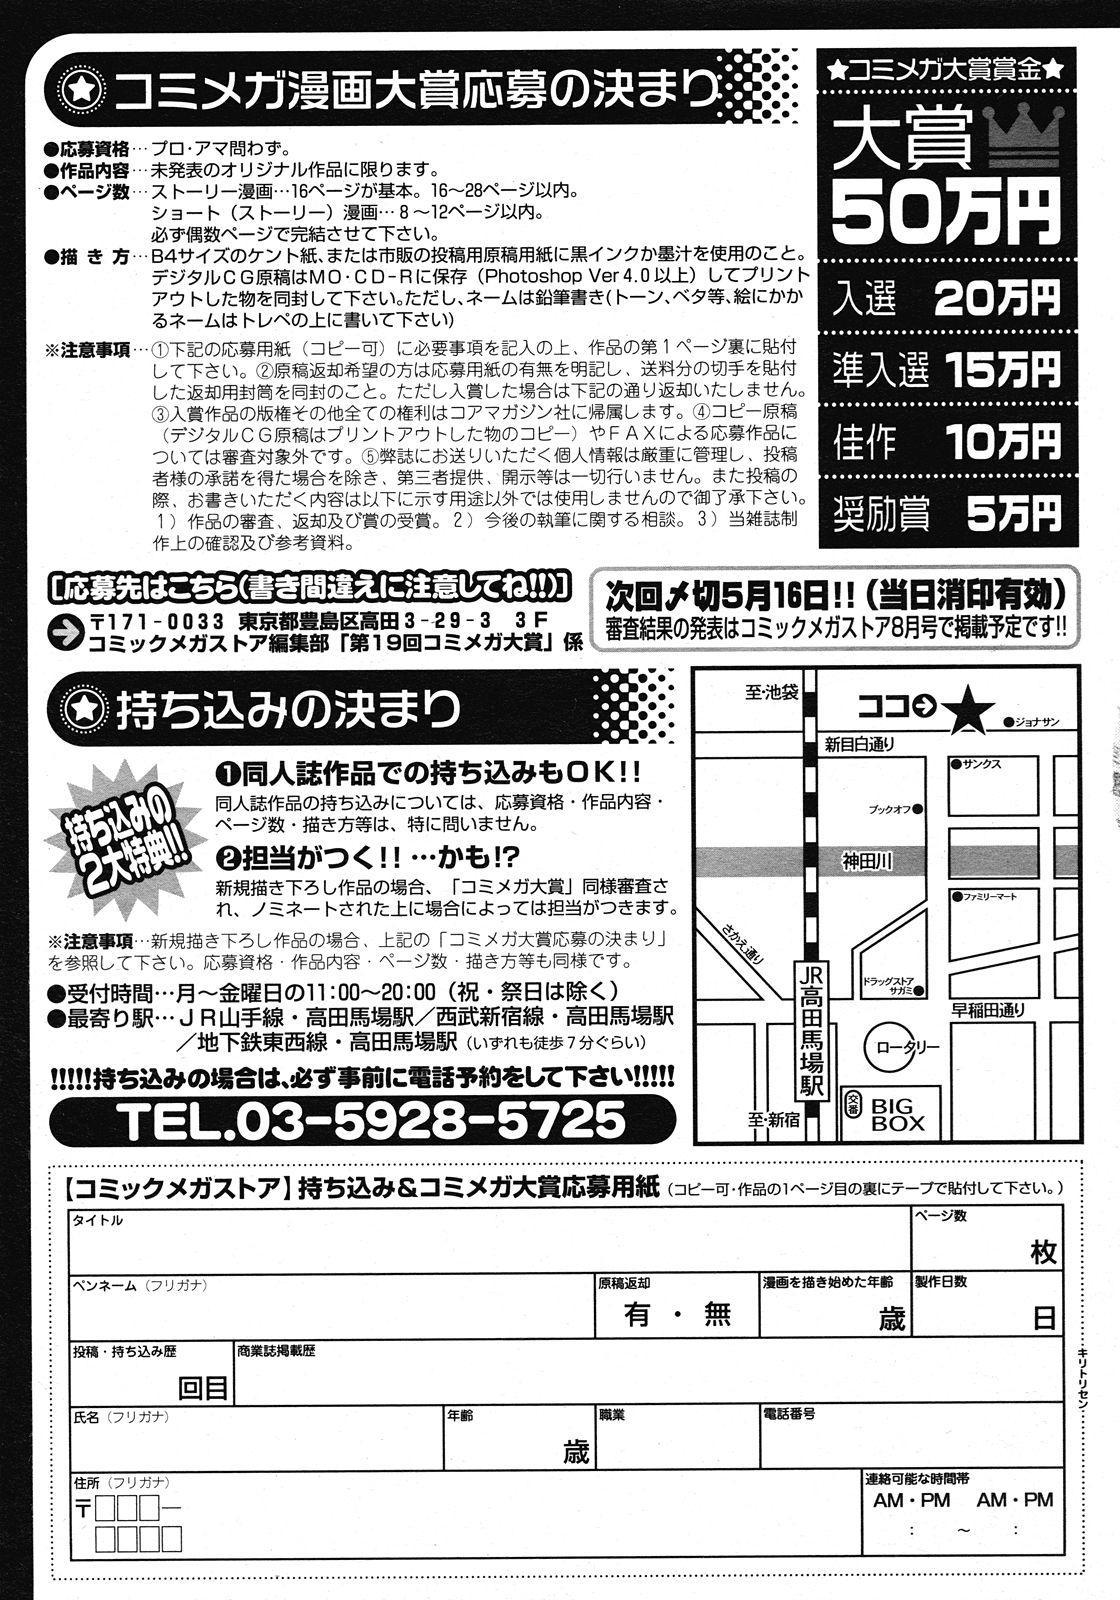 COMIC Megastore 2008-05 468